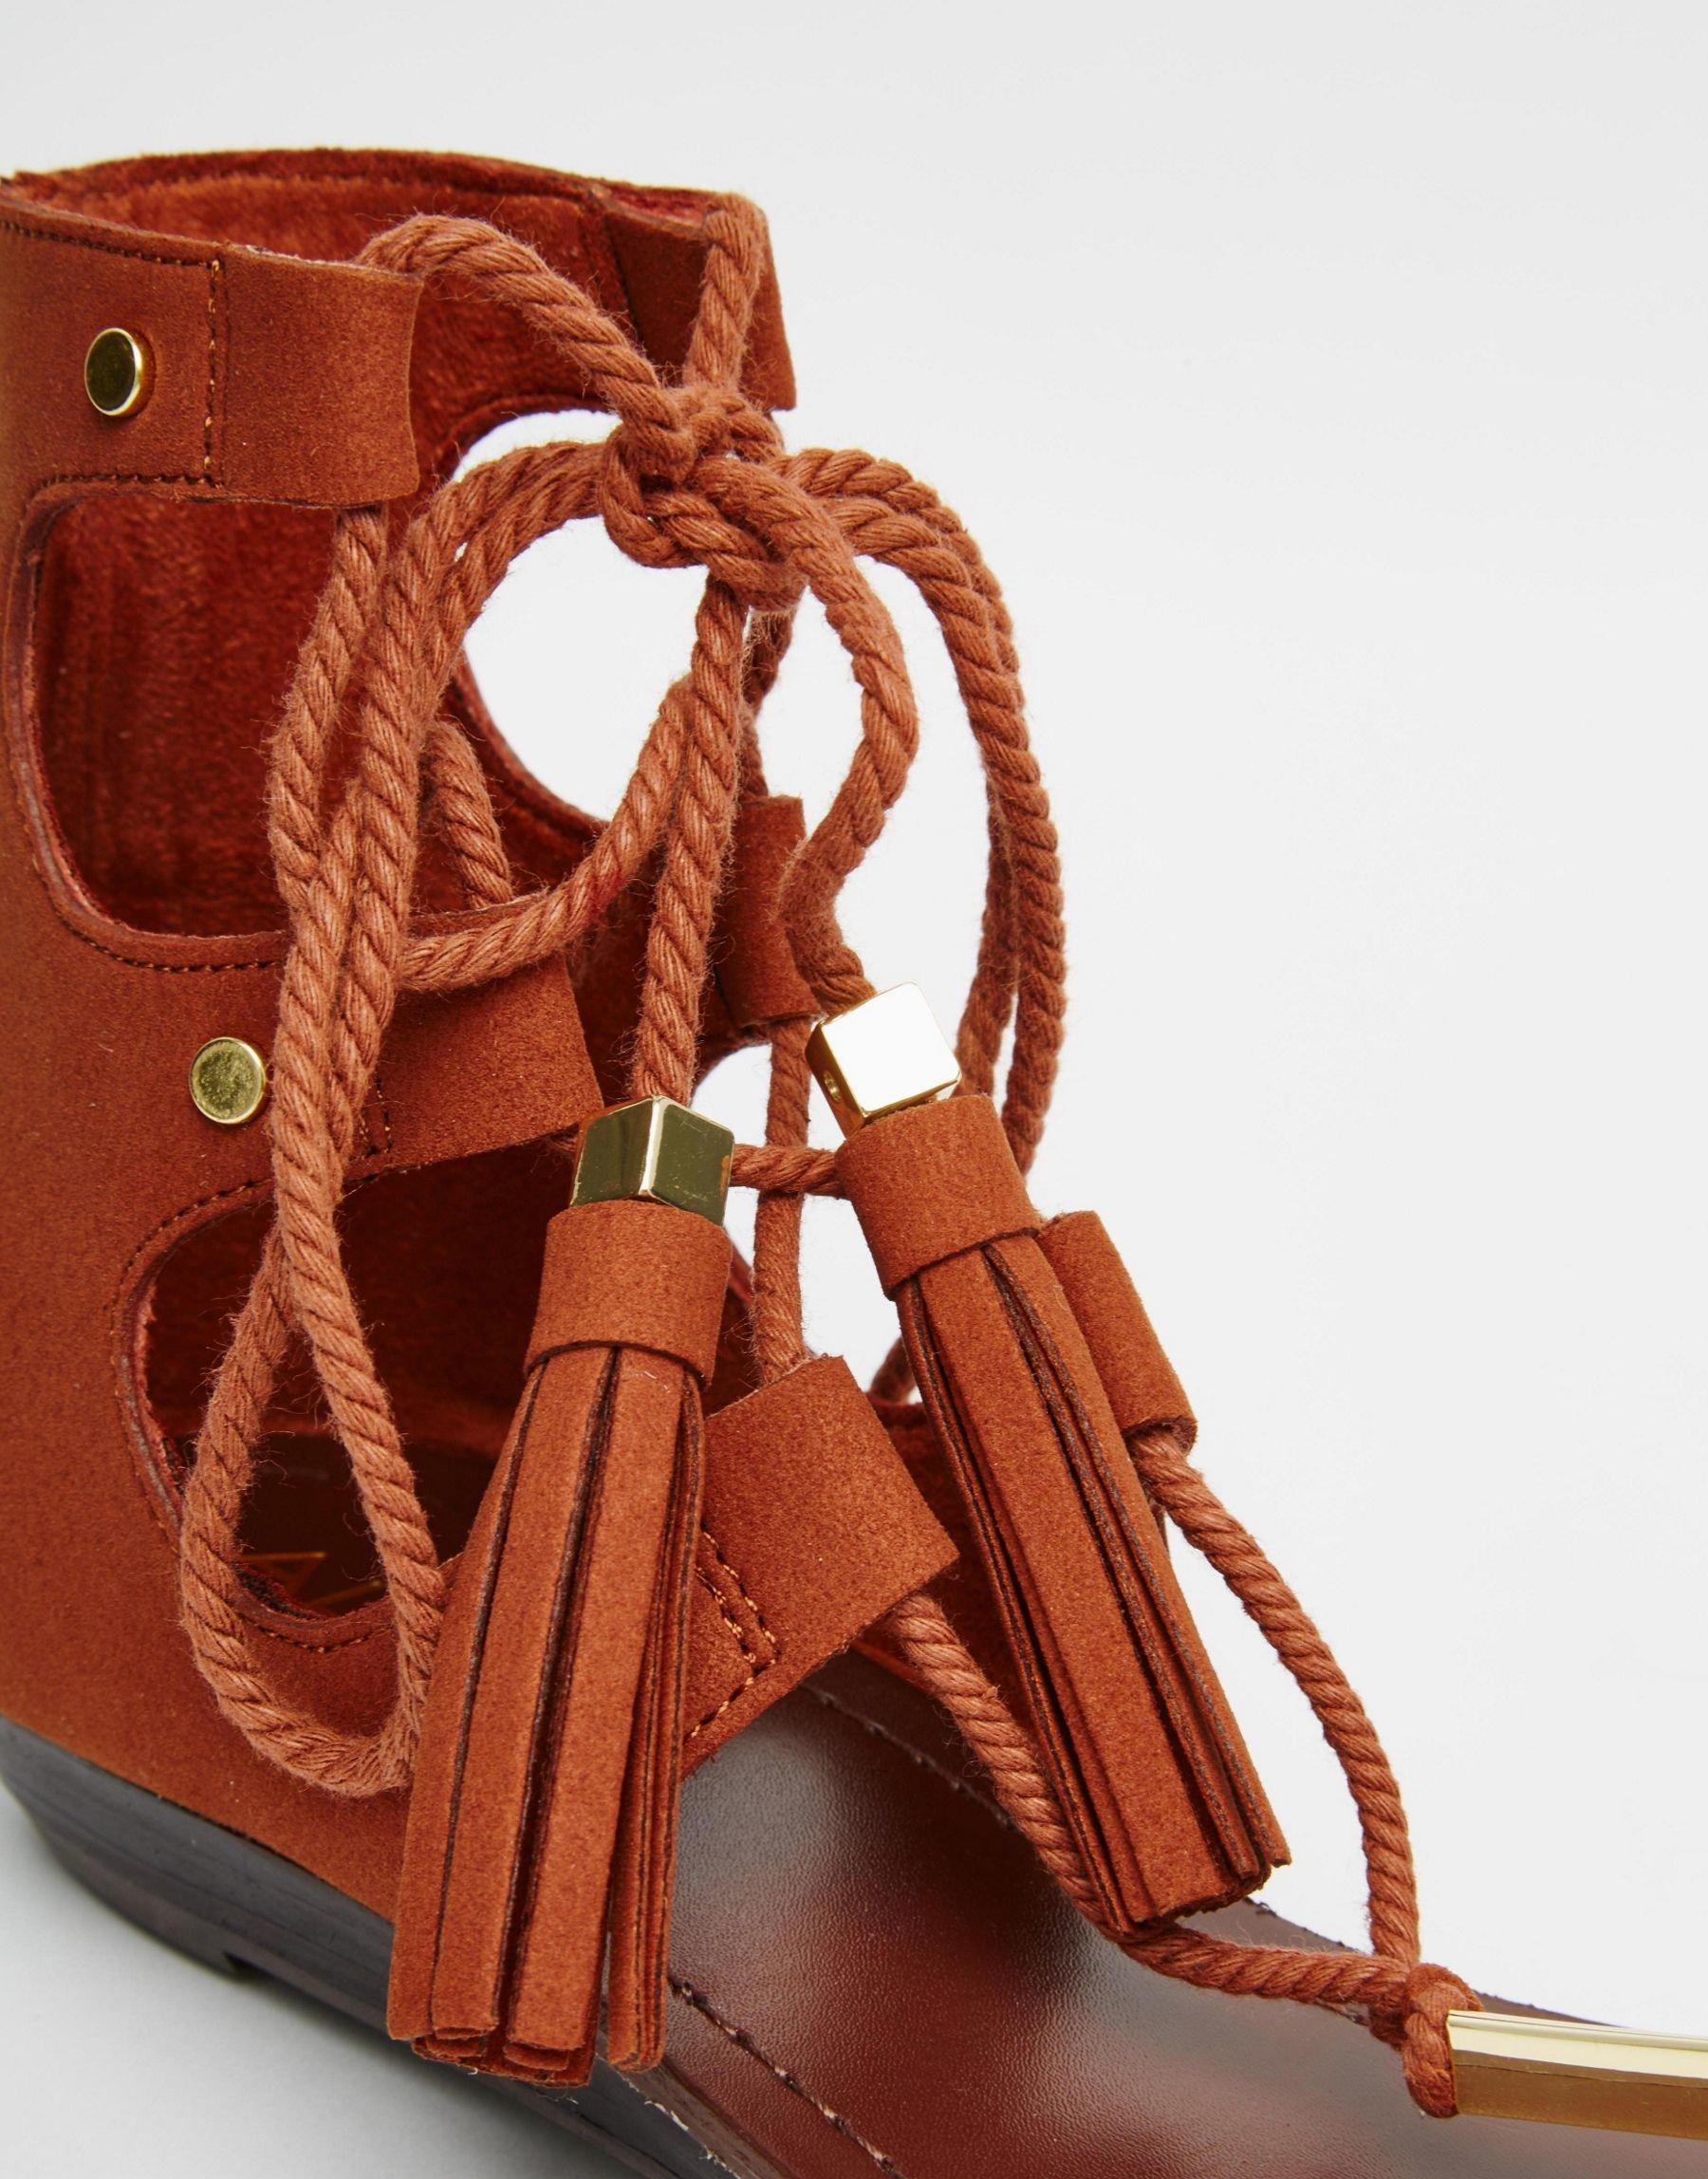 e196e02b415e Lyst - ALDO Jakki Rust Gladiator Tassel Flat Sandals in Brown